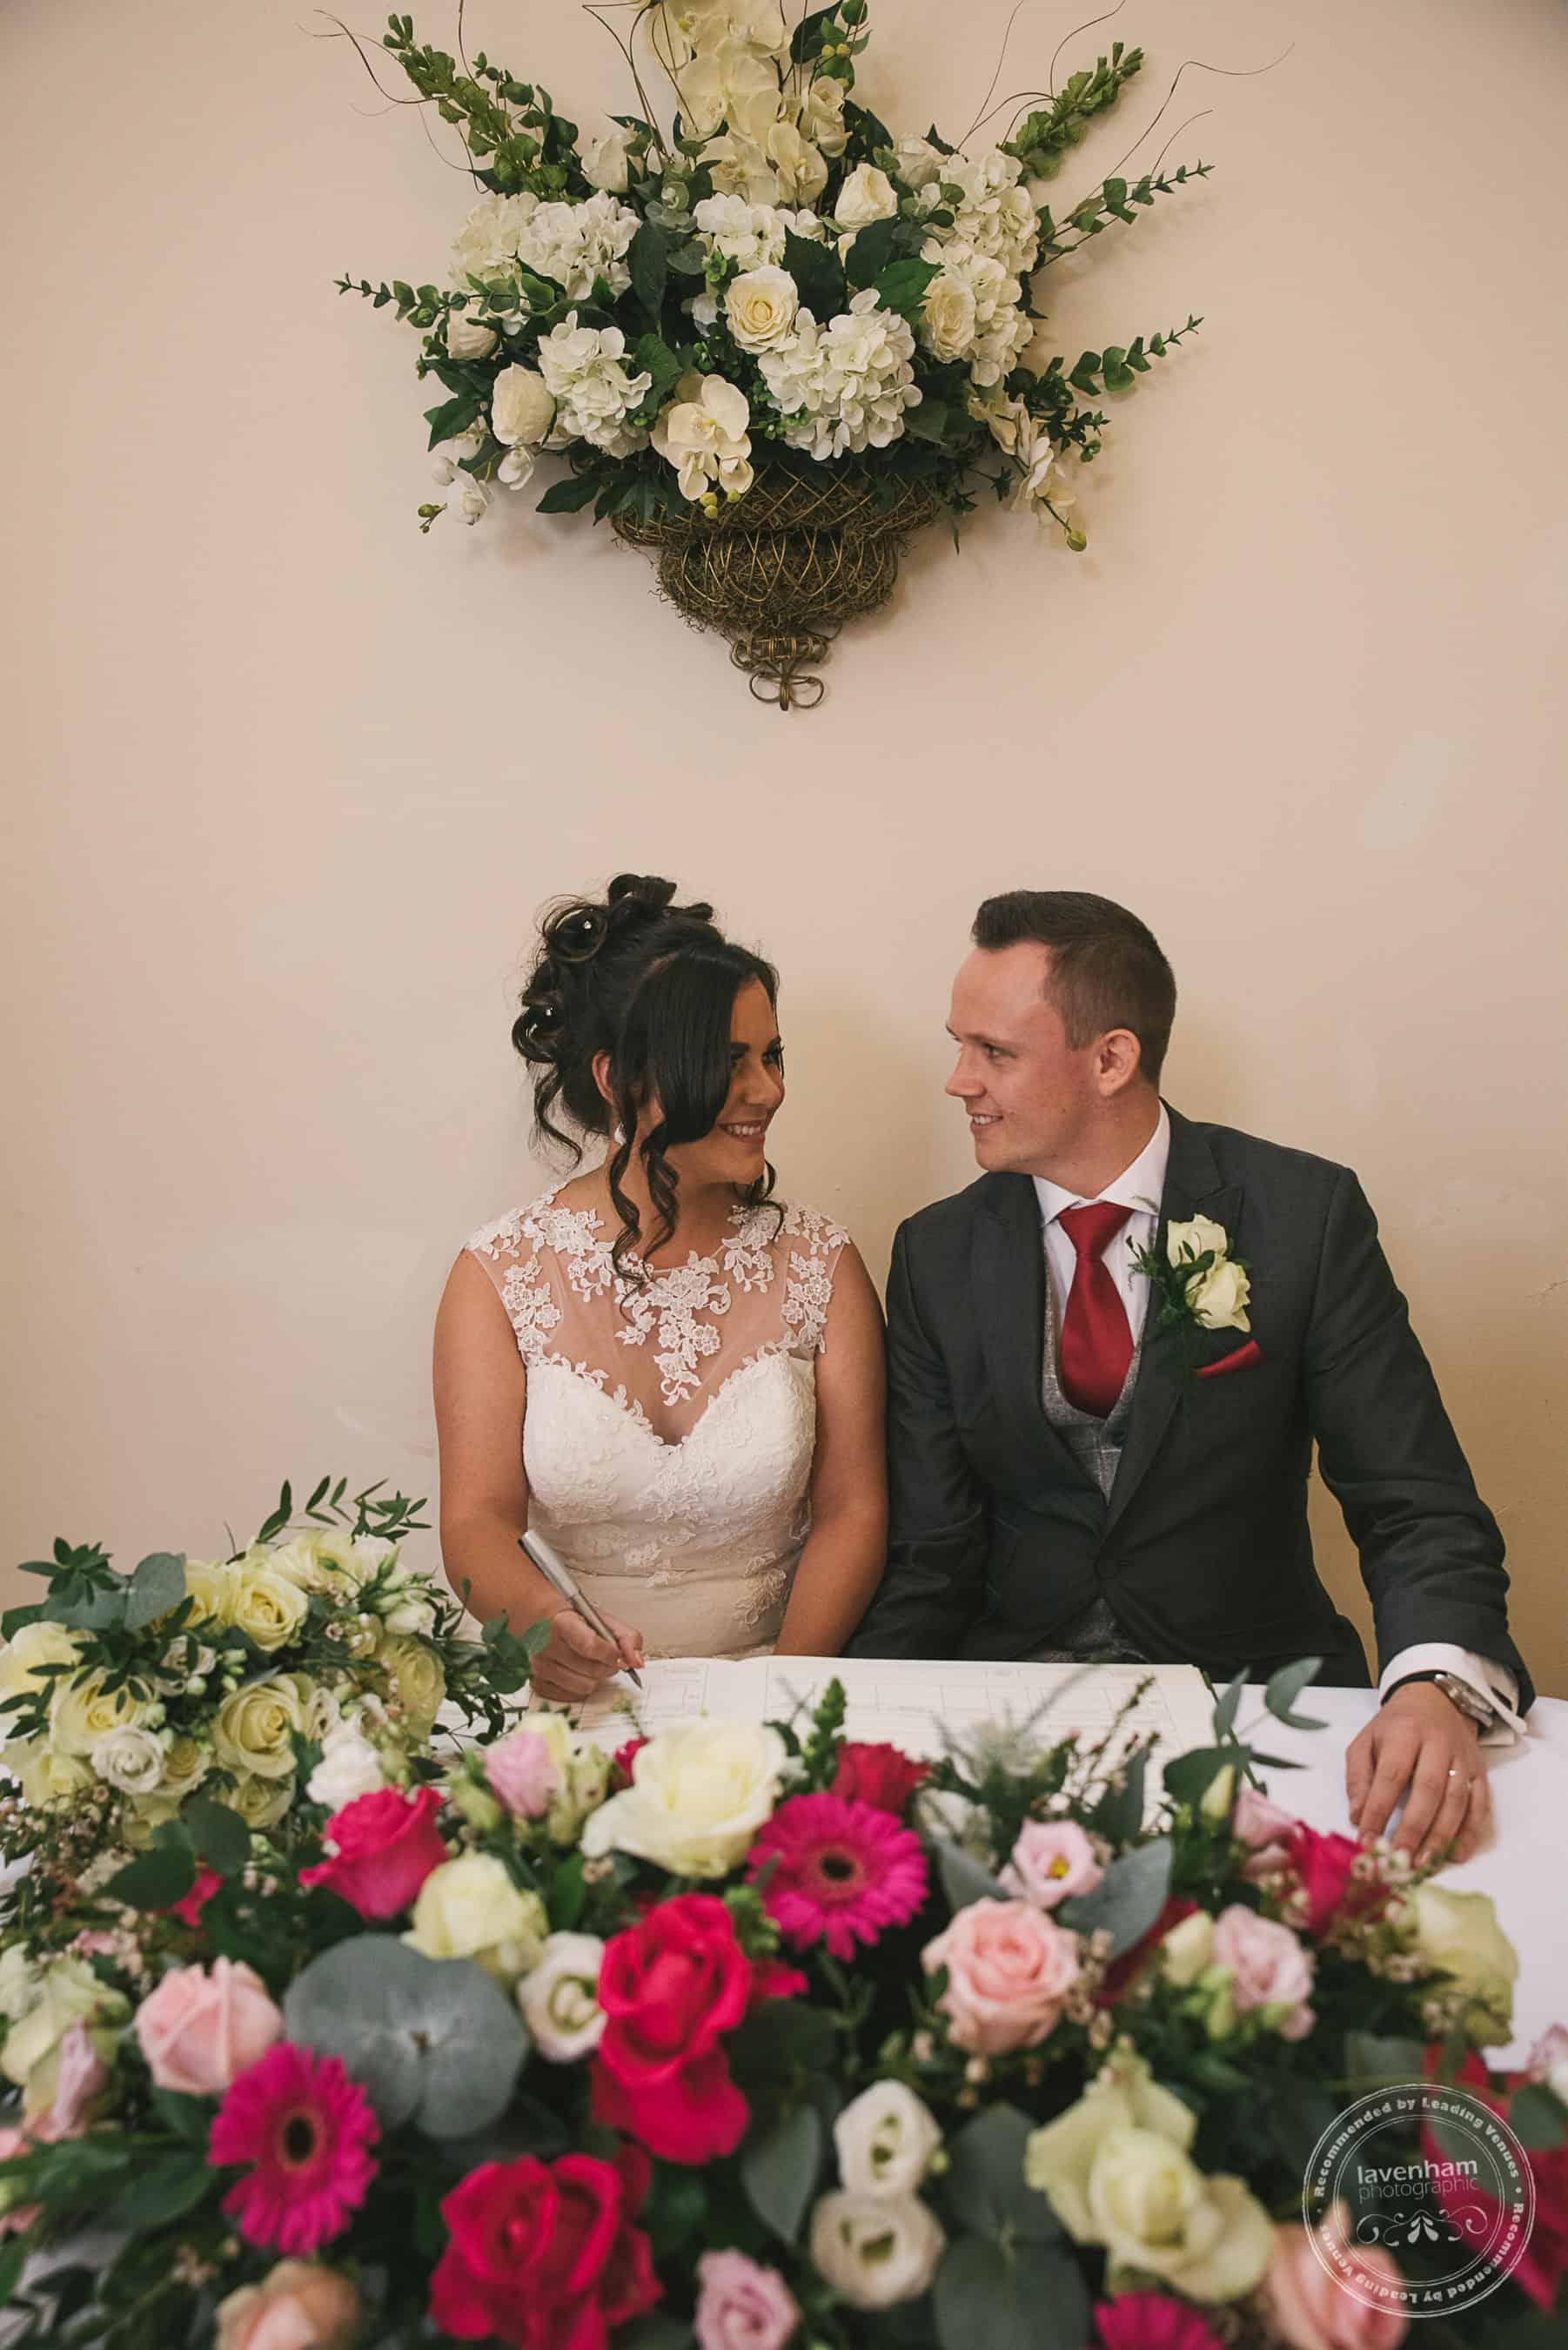 251118 Leez Priory Wedding Photography by Lavenham Photographic 044